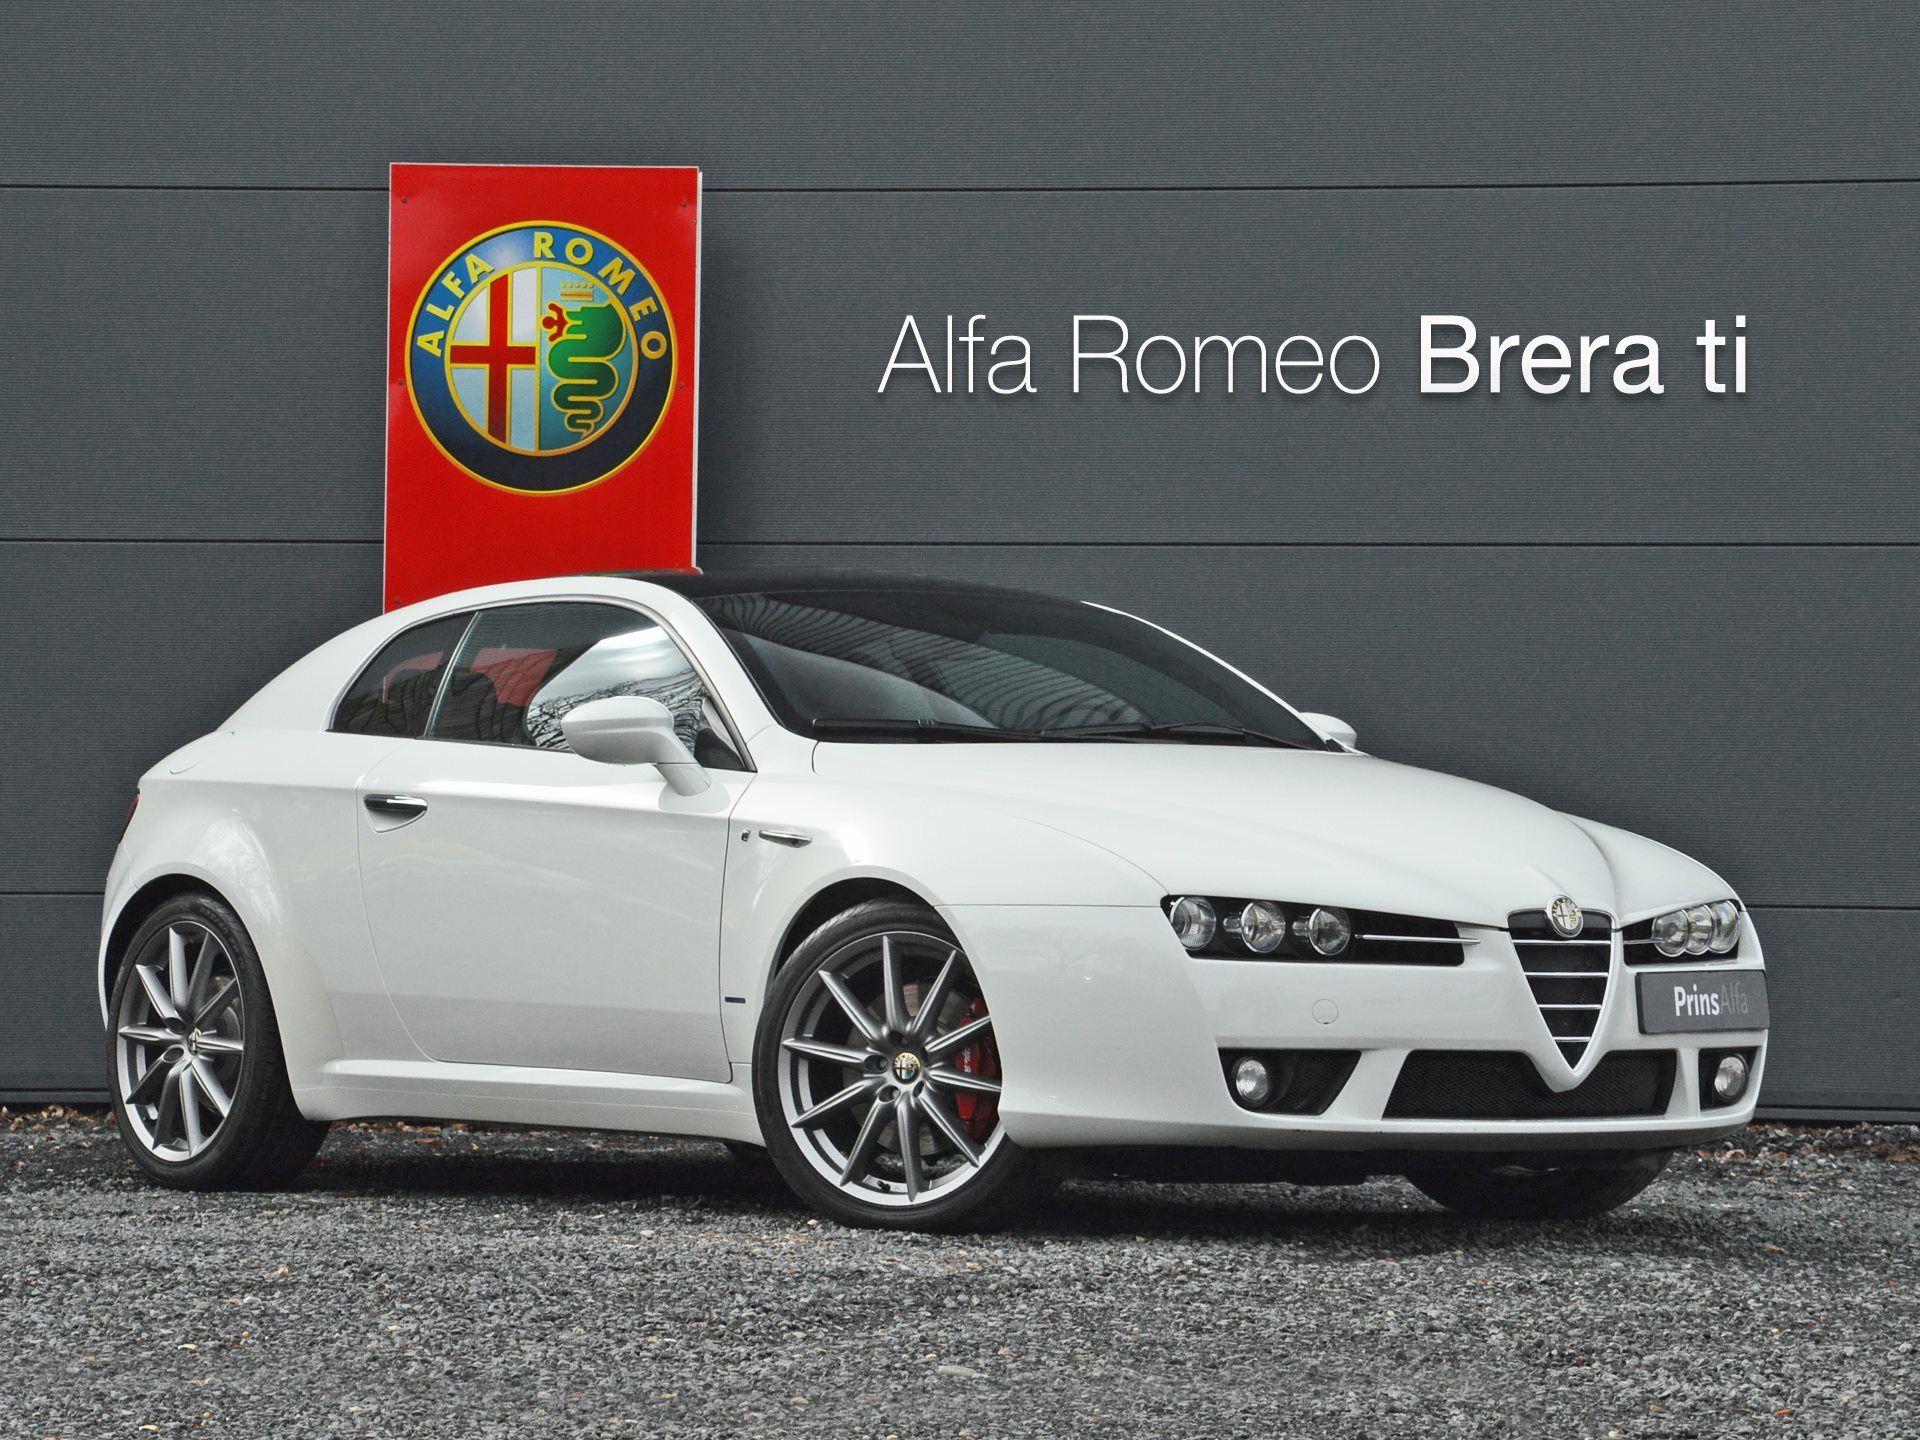 alfa romeo brera ti forgotten classic cars pinterest alfa romeo brera alfa romeo and alfa. Black Bedroom Furniture Sets. Home Design Ideas